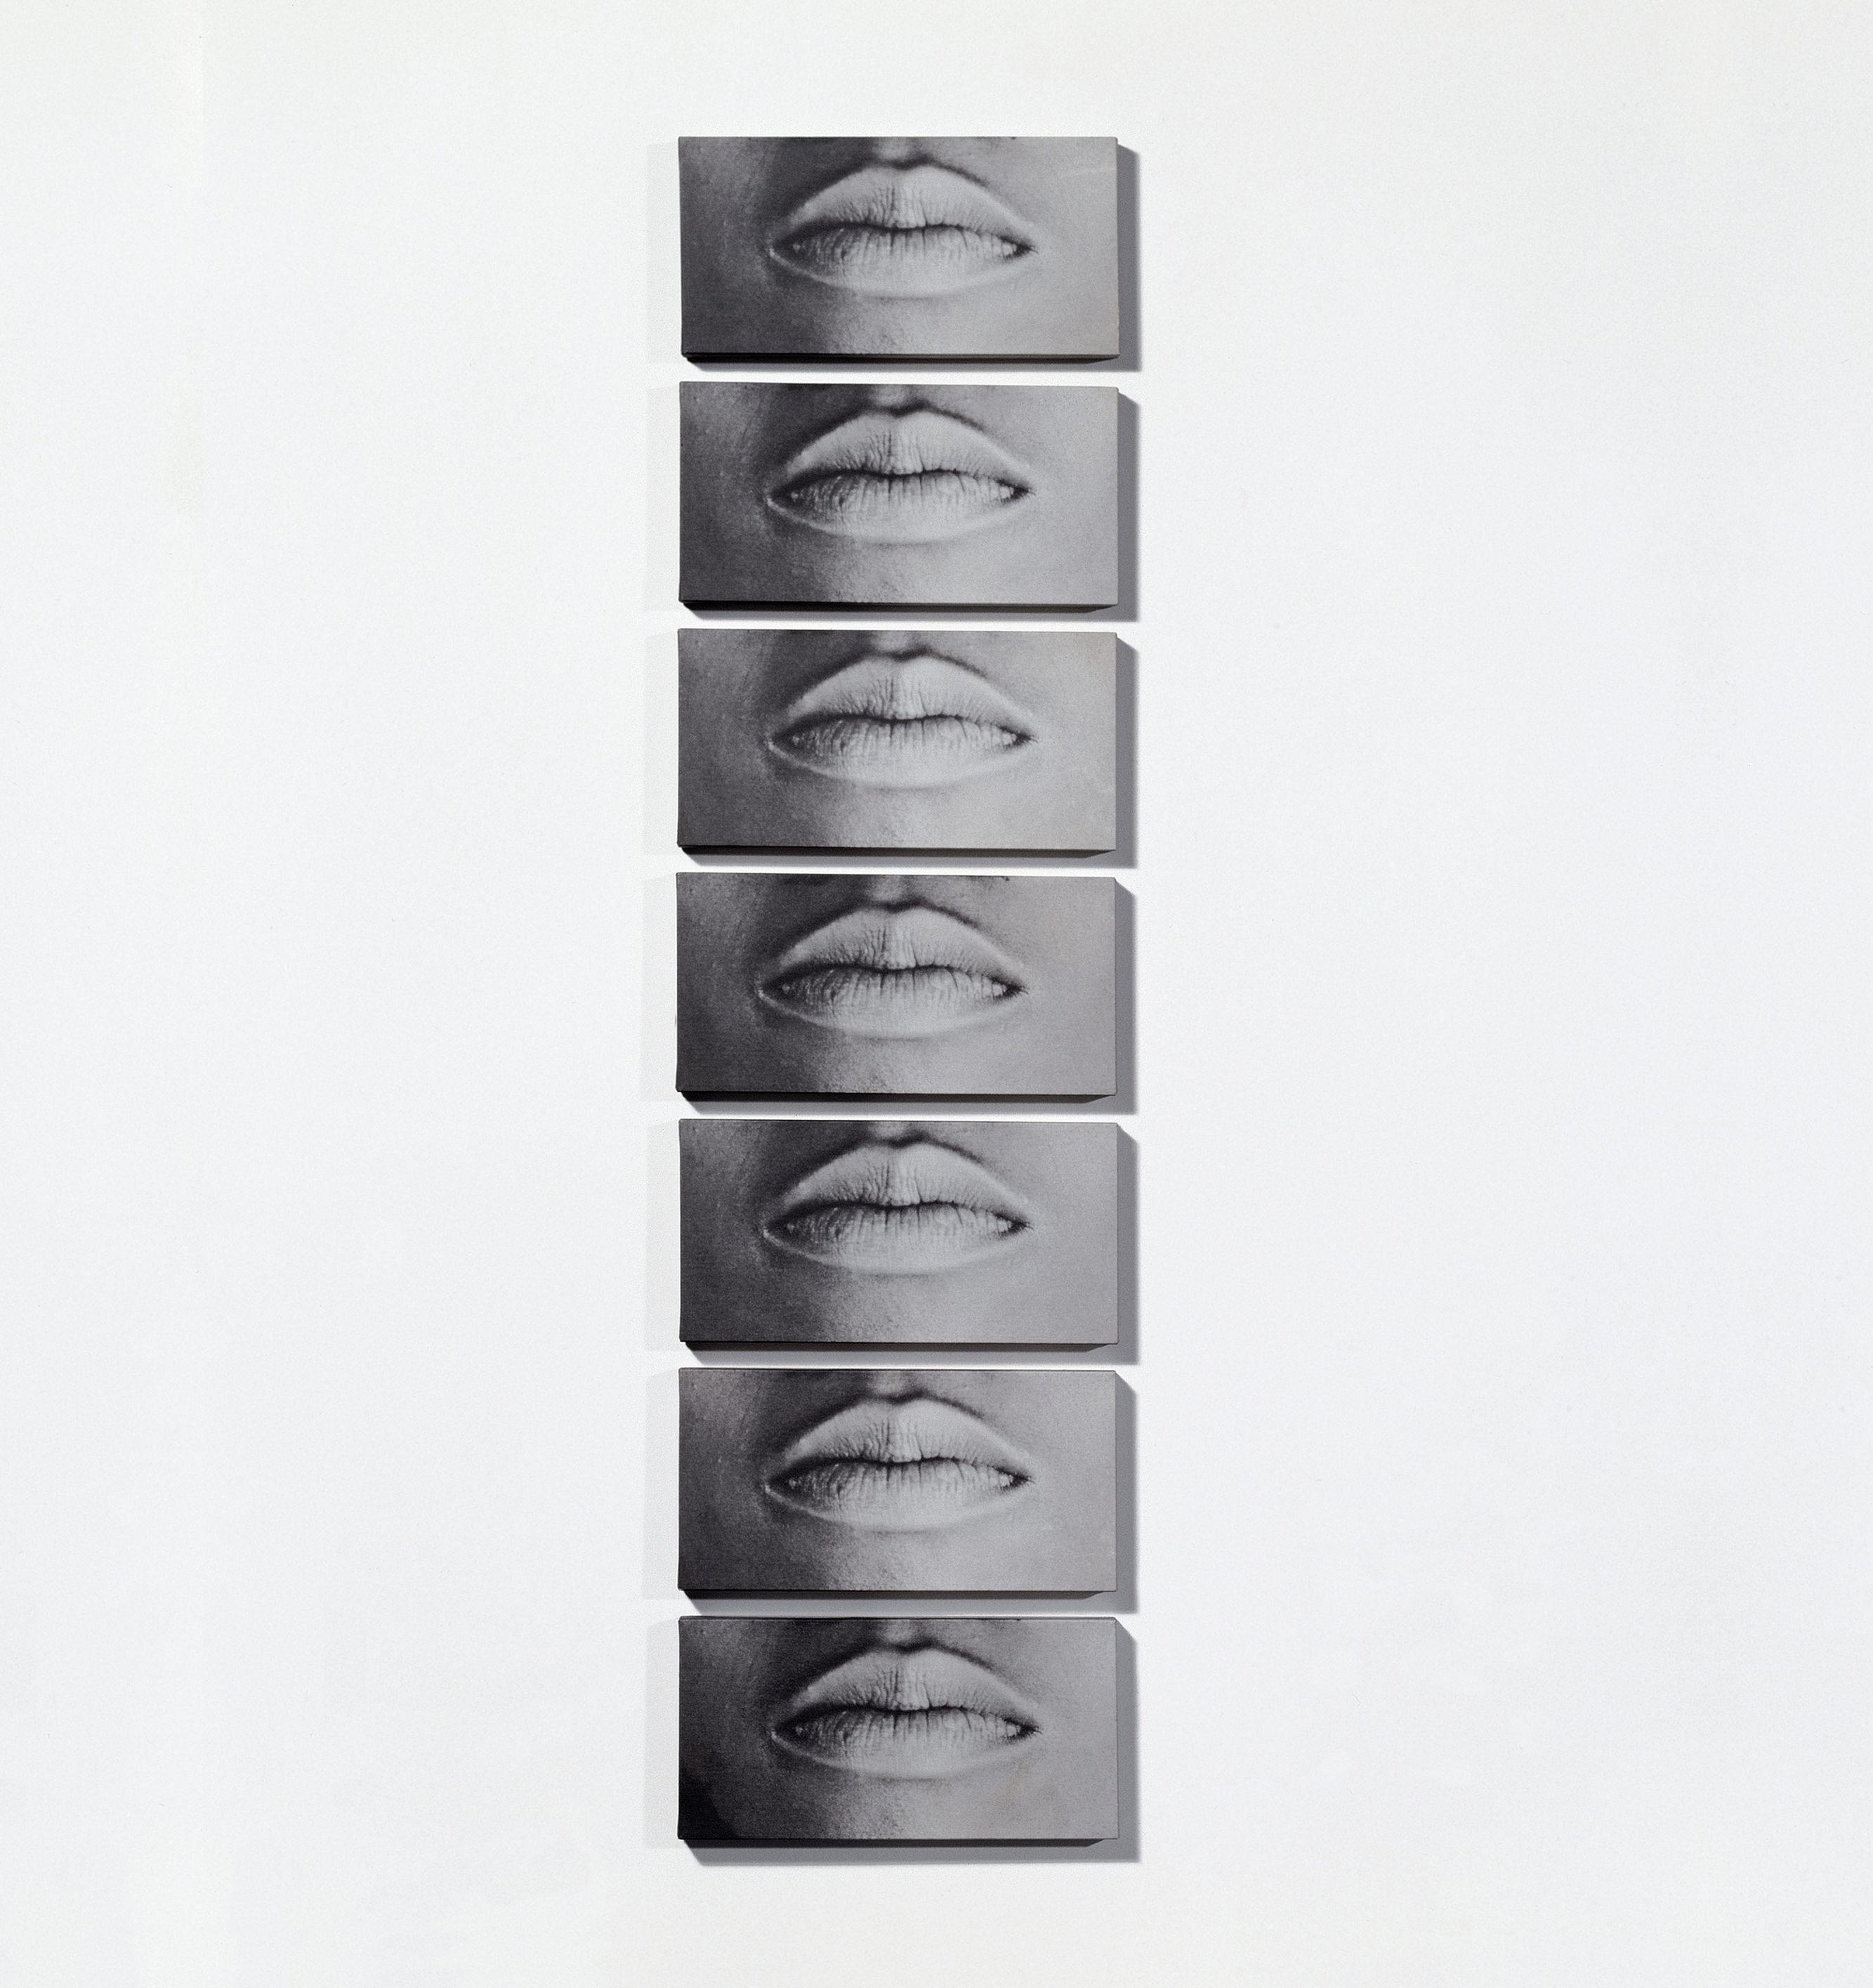 7 Mouths, 1993